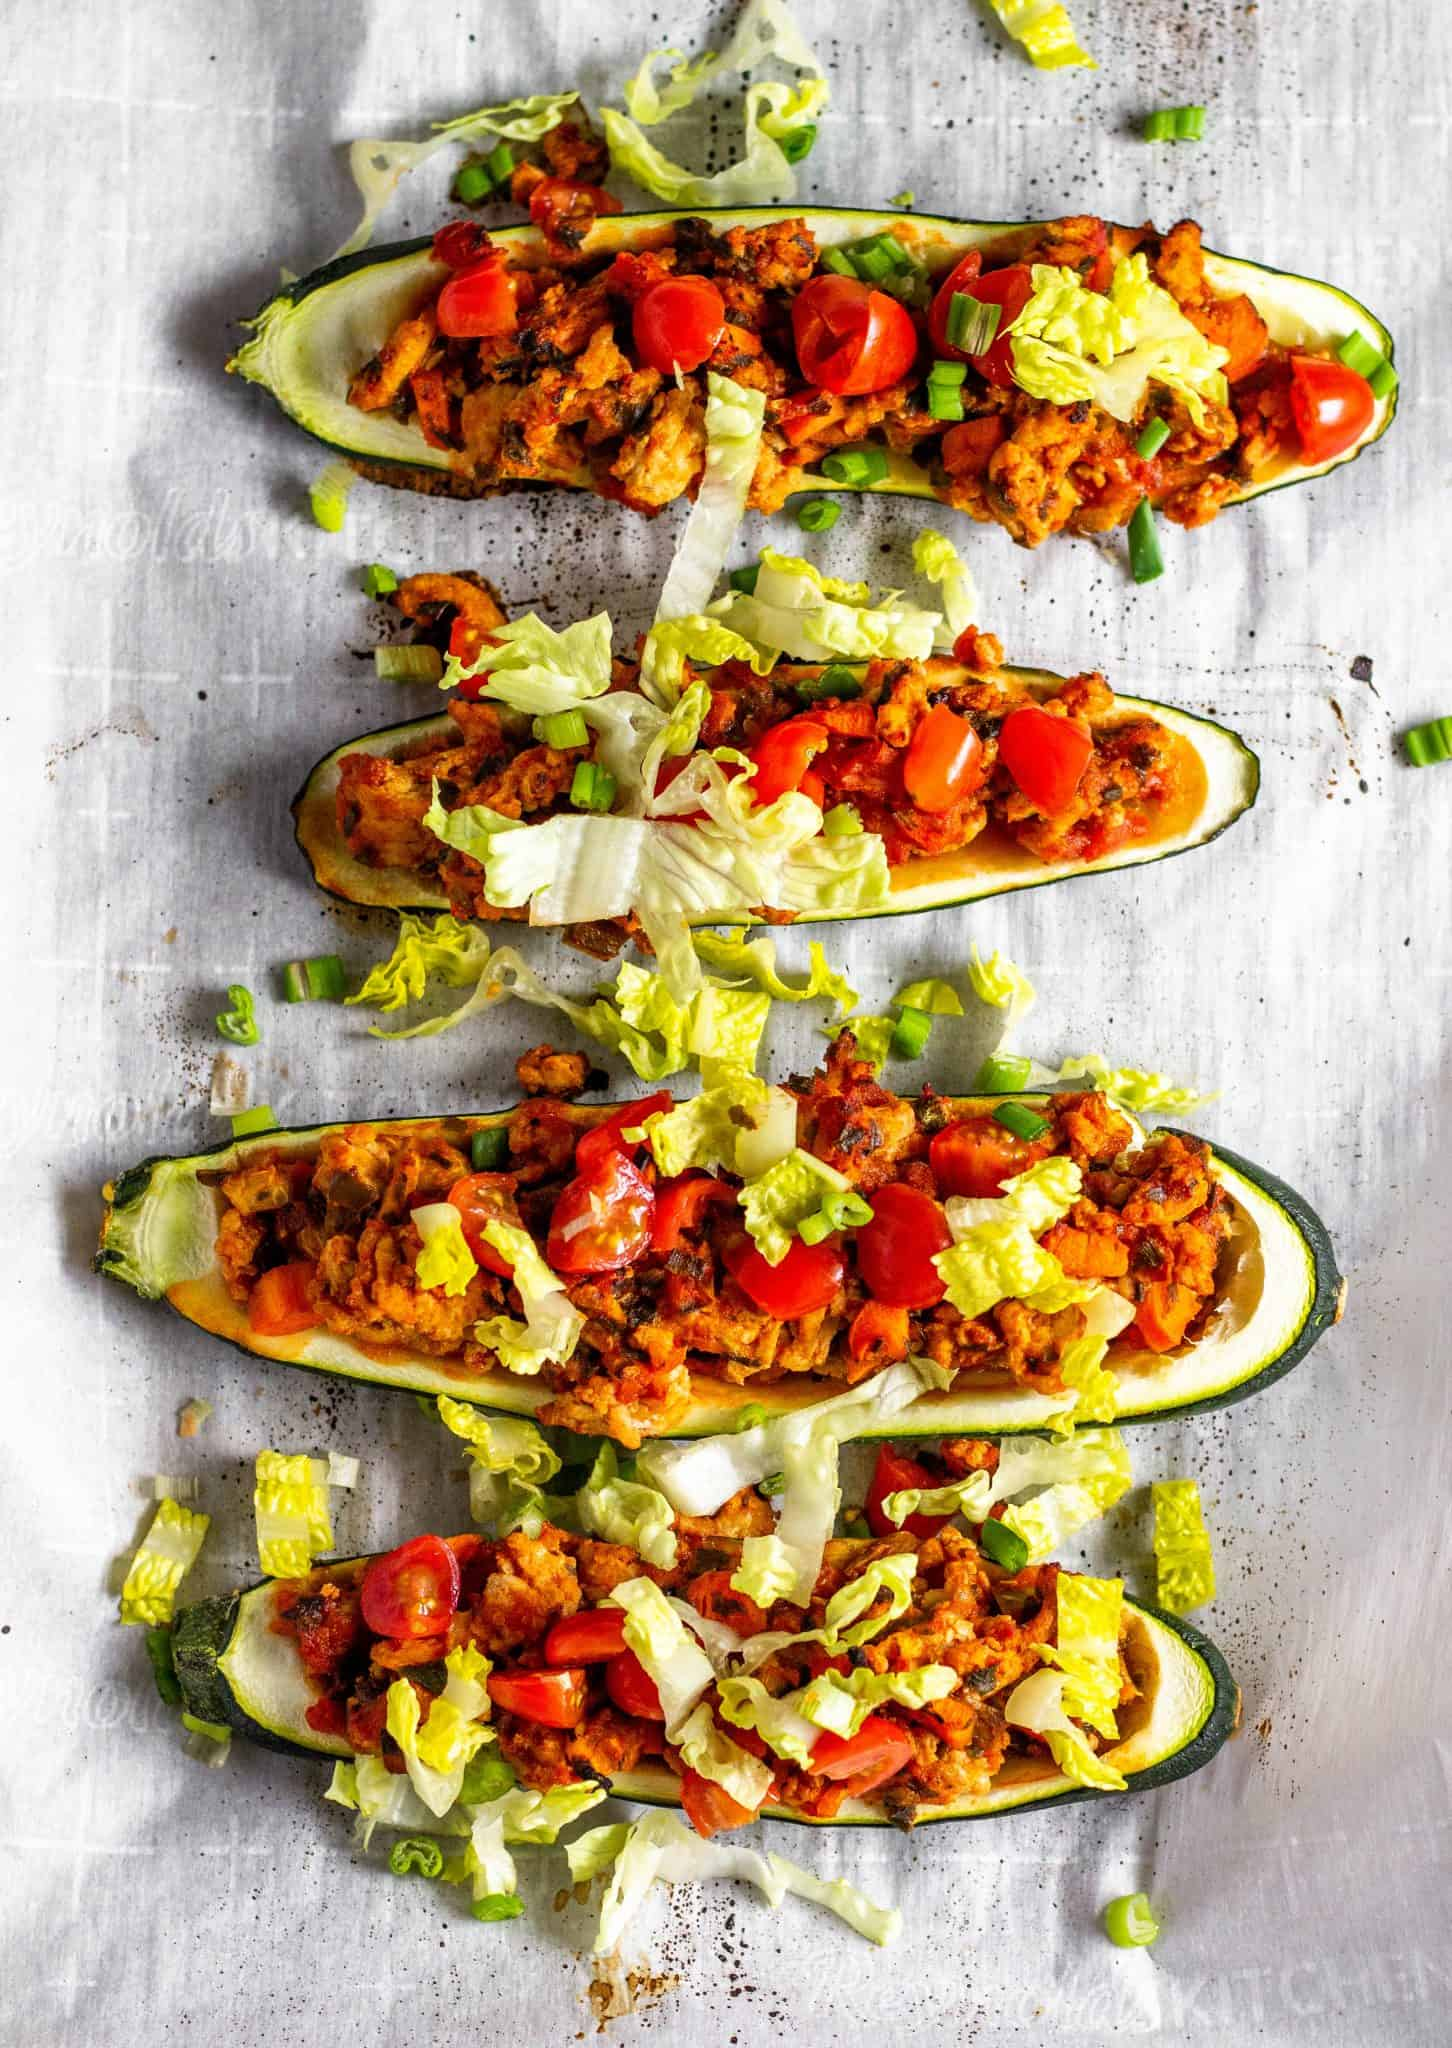 Taco Zucchini Boats #lowfodmap #tararochfordnutrition